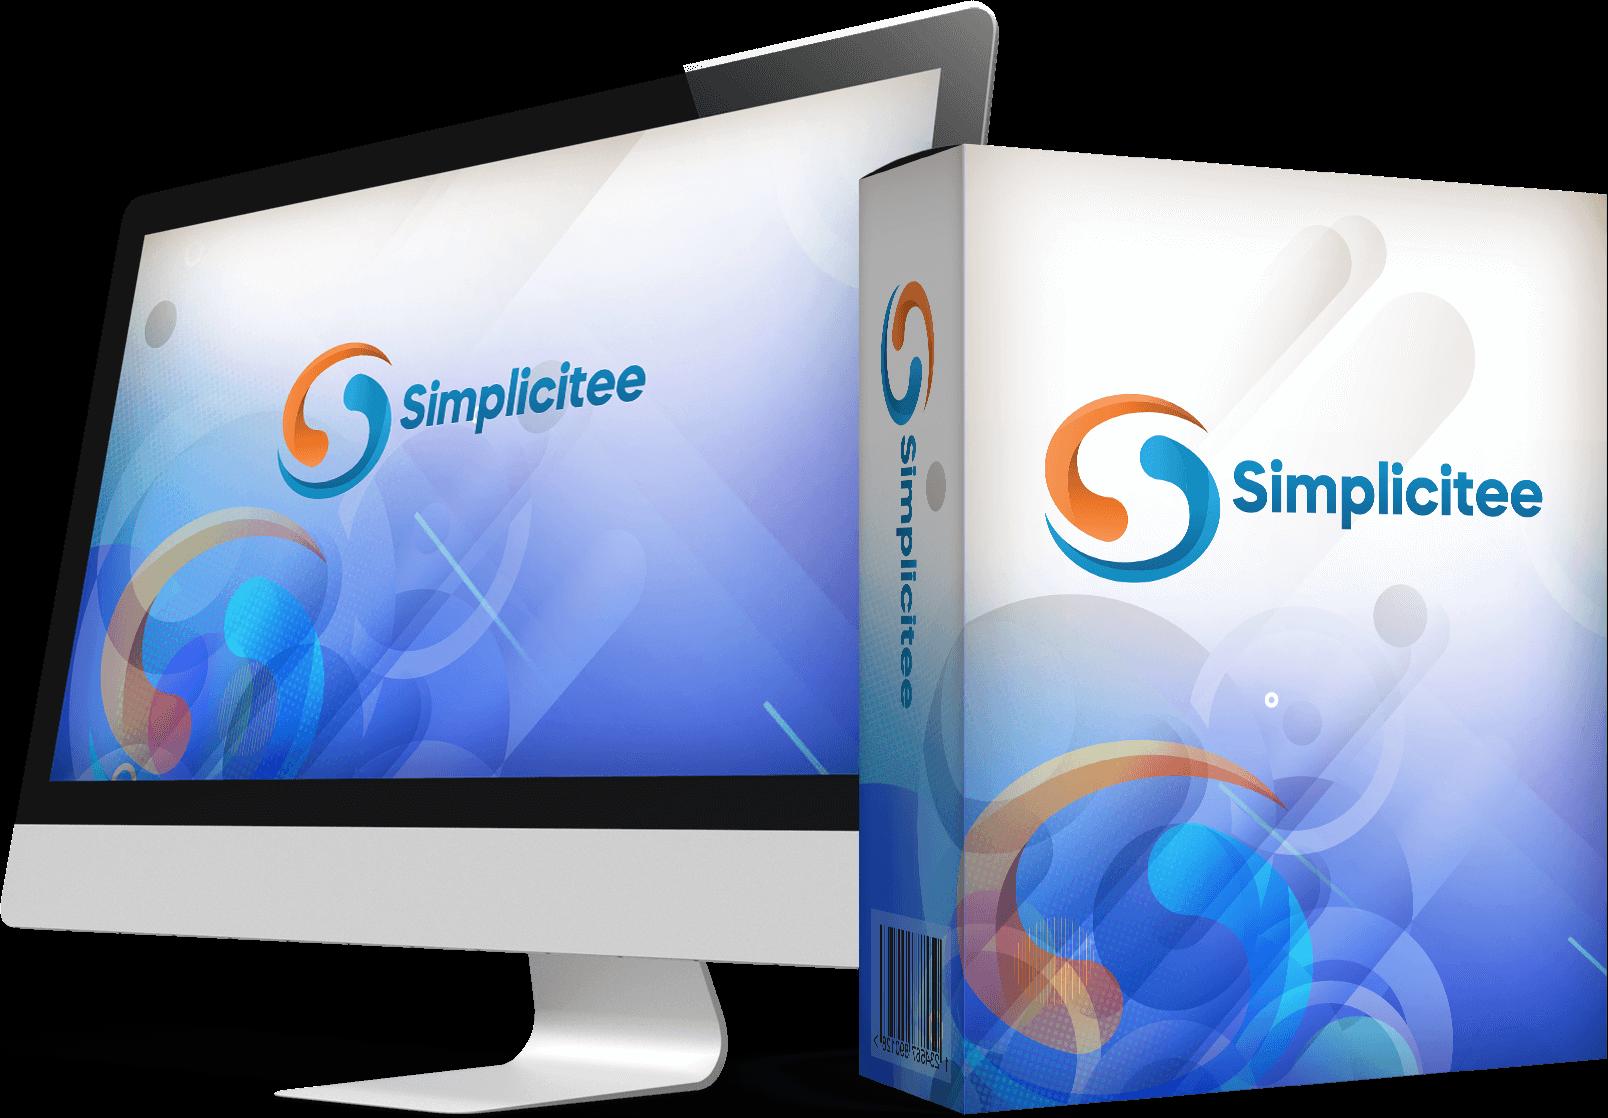 Simplicitee-review